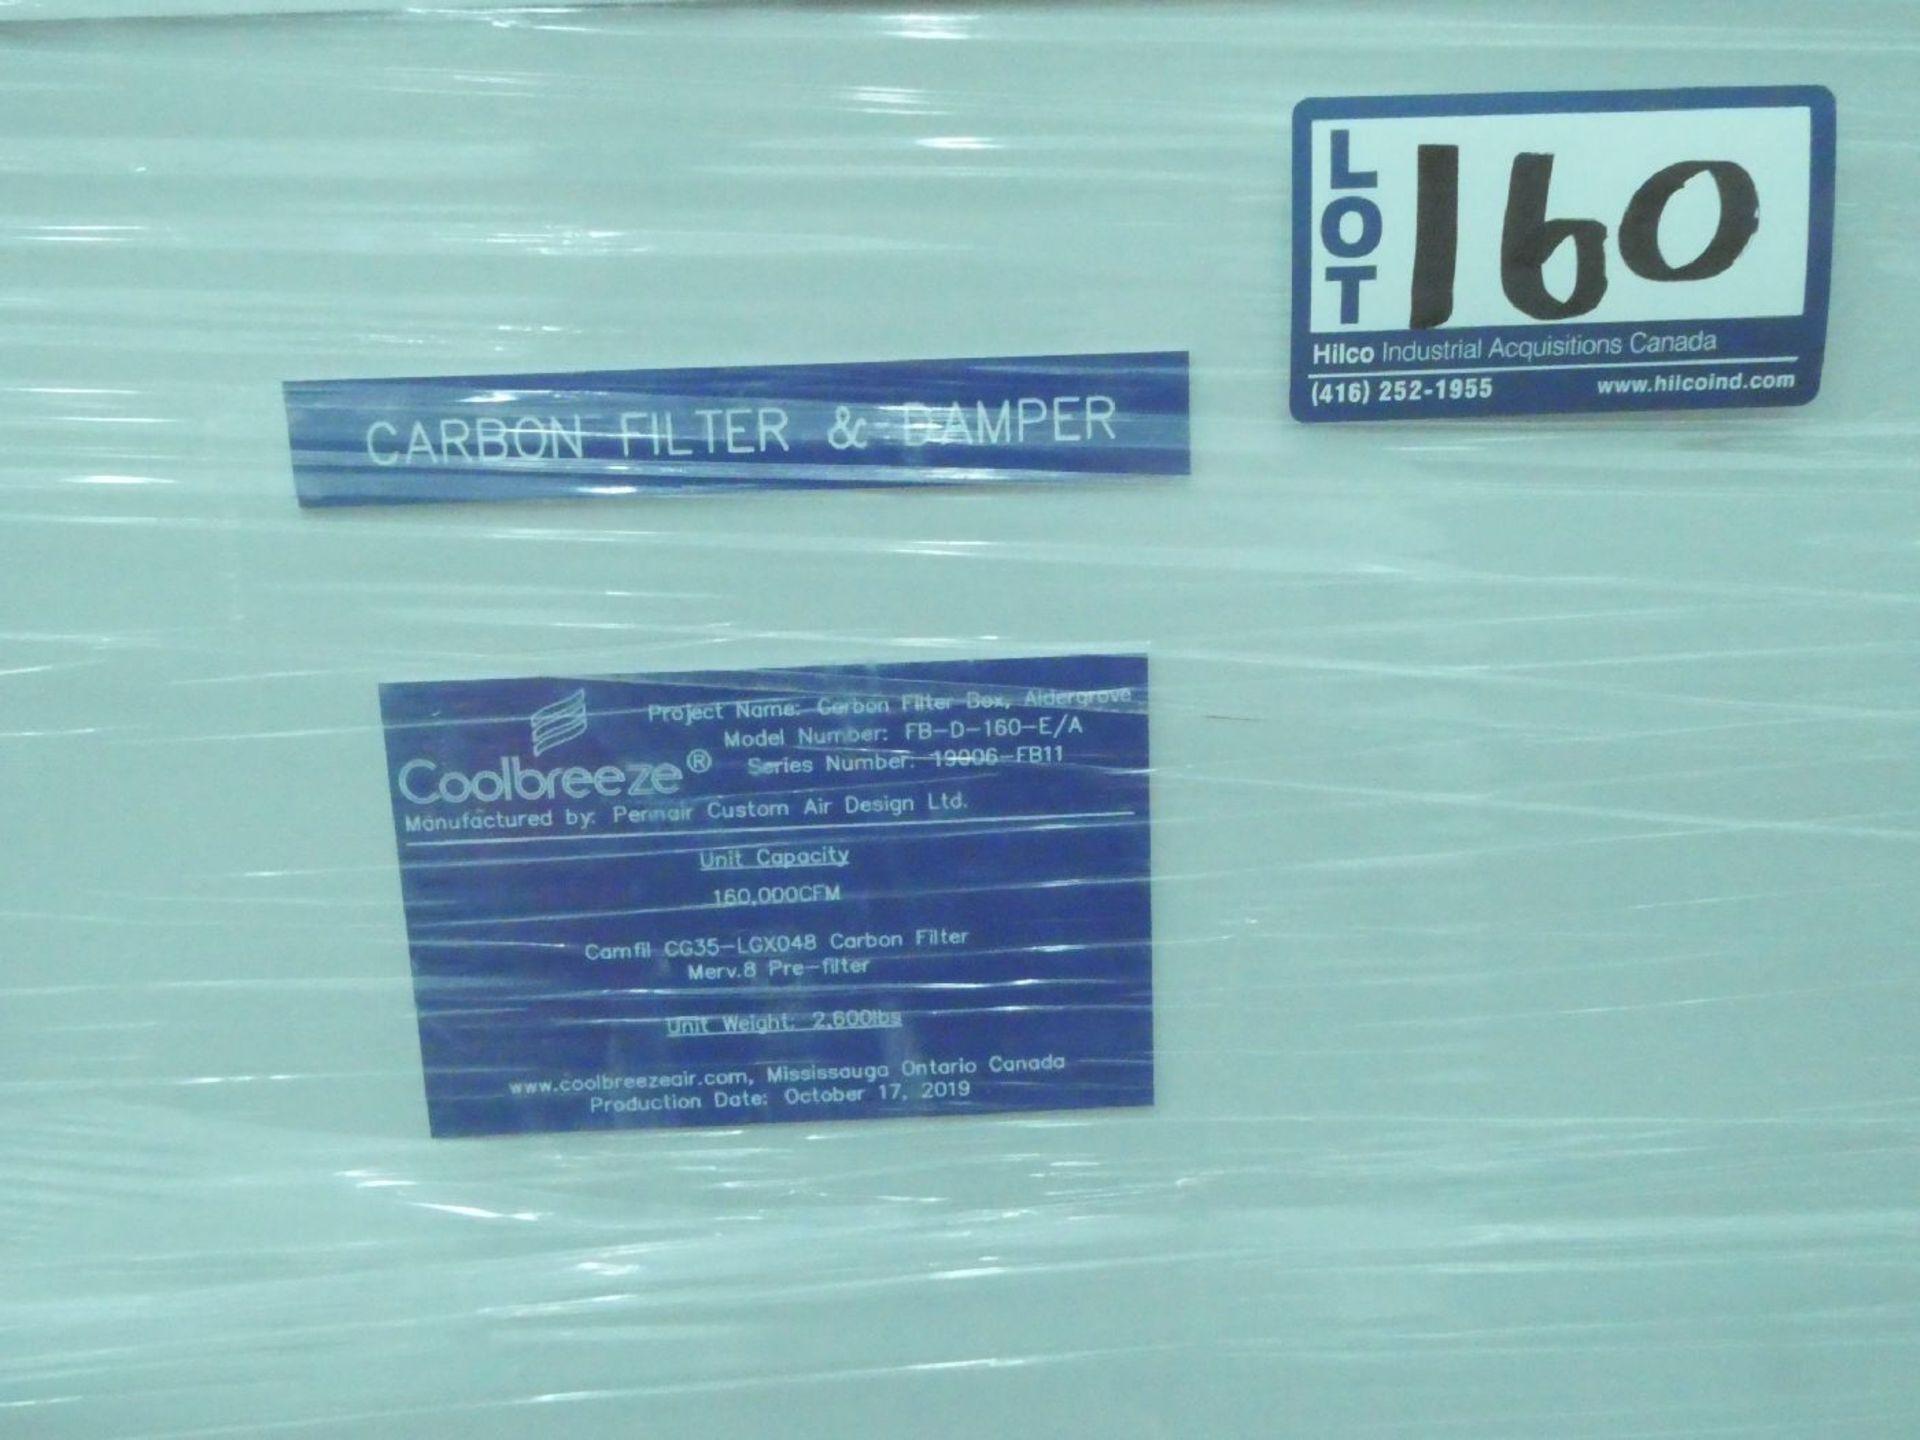 Pennair FB-D-160-E/A Coolbreeze 160,000CFM Carbon Filter Box - Image 3 of 3